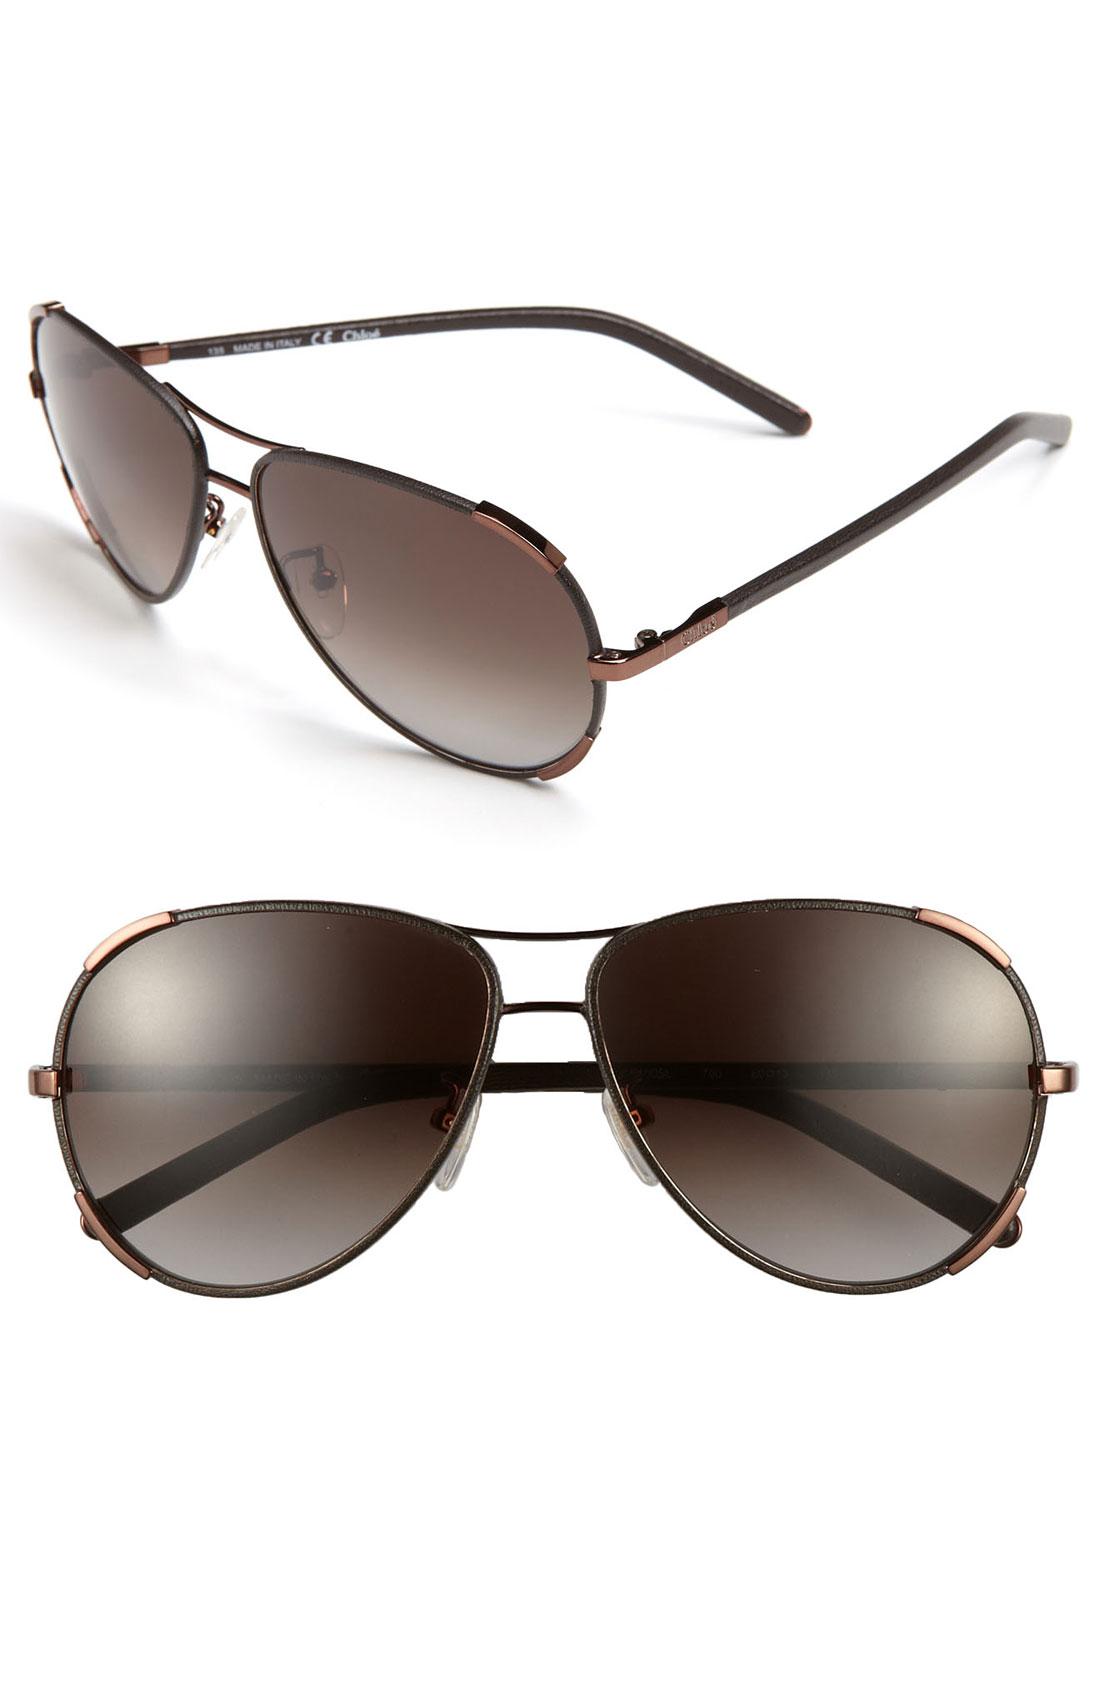 Chlo 233 60mm Aviator Sunglasses Bronze In Brown Bronze